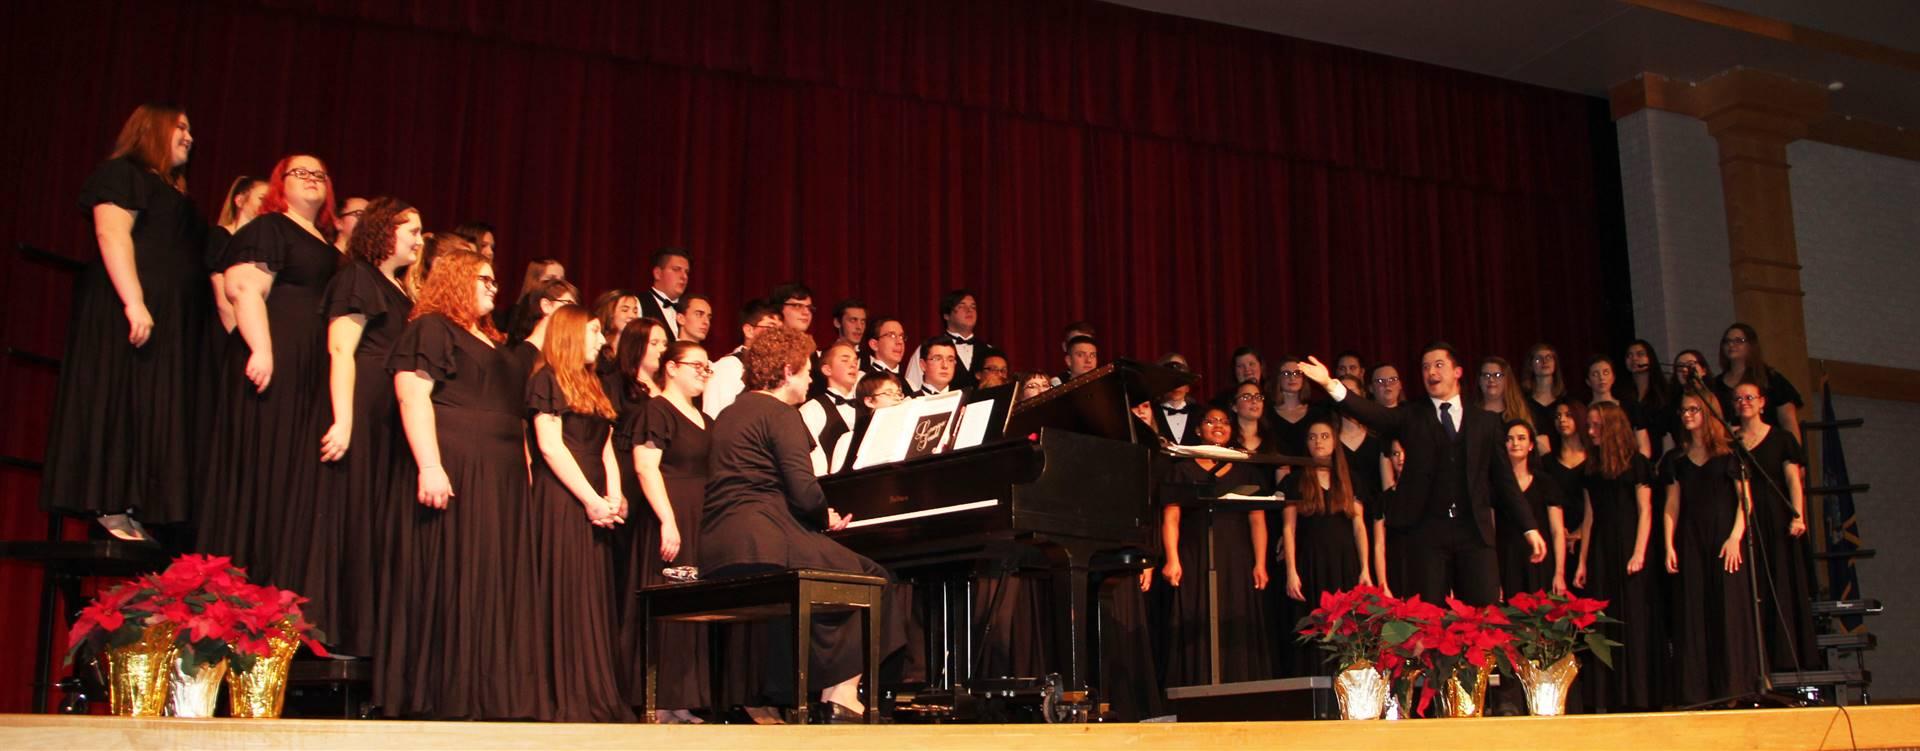 student chorus singing